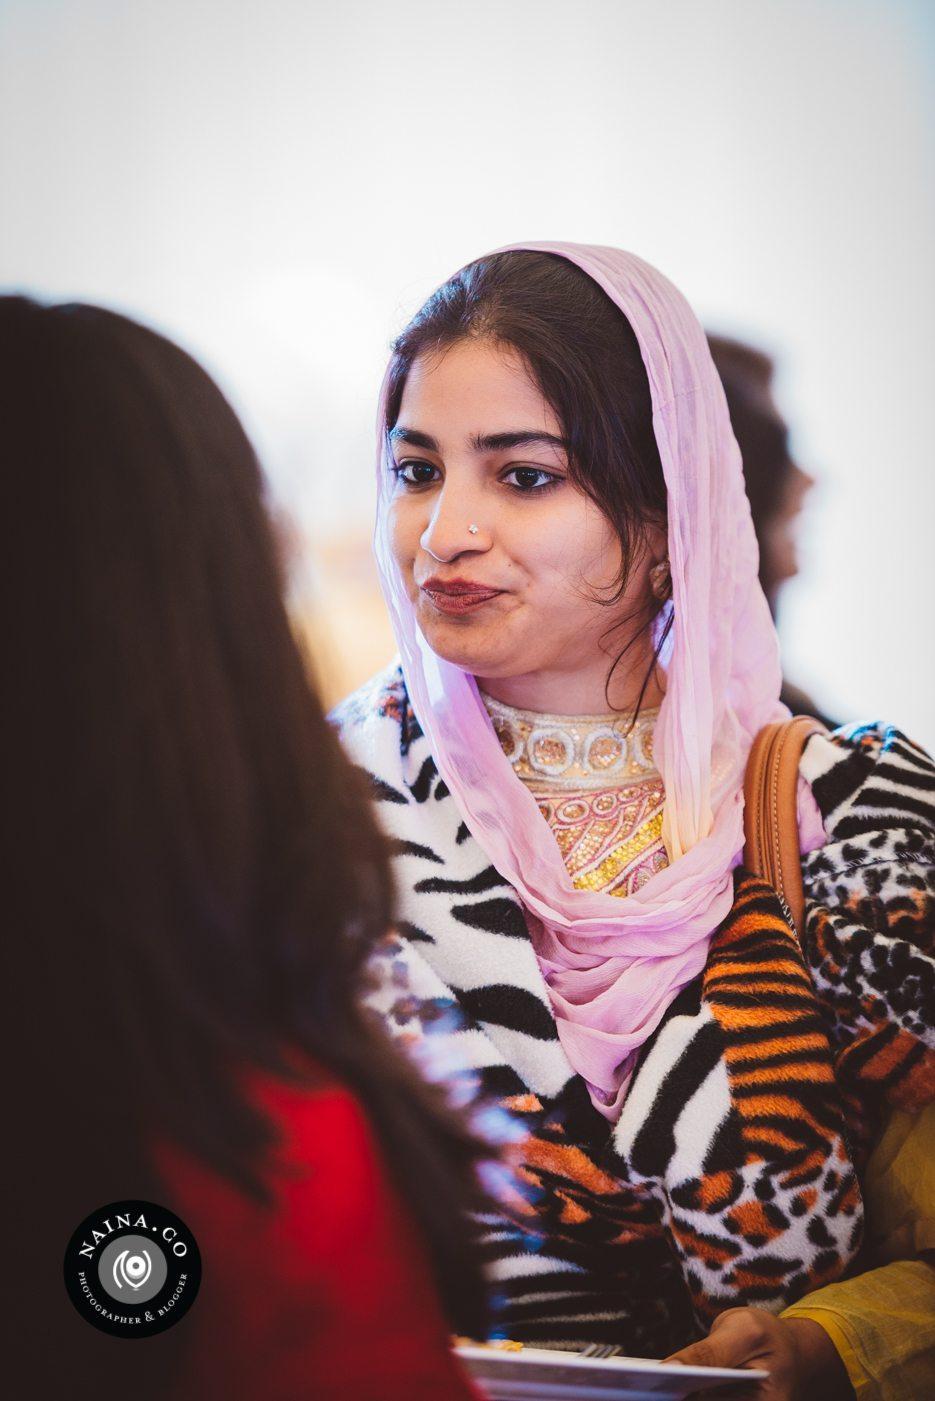 Naina.co-Raconteuse-Visuelle-Photographer-Blogger-Storyteller-Luxury-Lifestyle-January-2015-St.Regis-Polo-Cup-Maharaja-Jaipur-EyesForStreetStyle-23